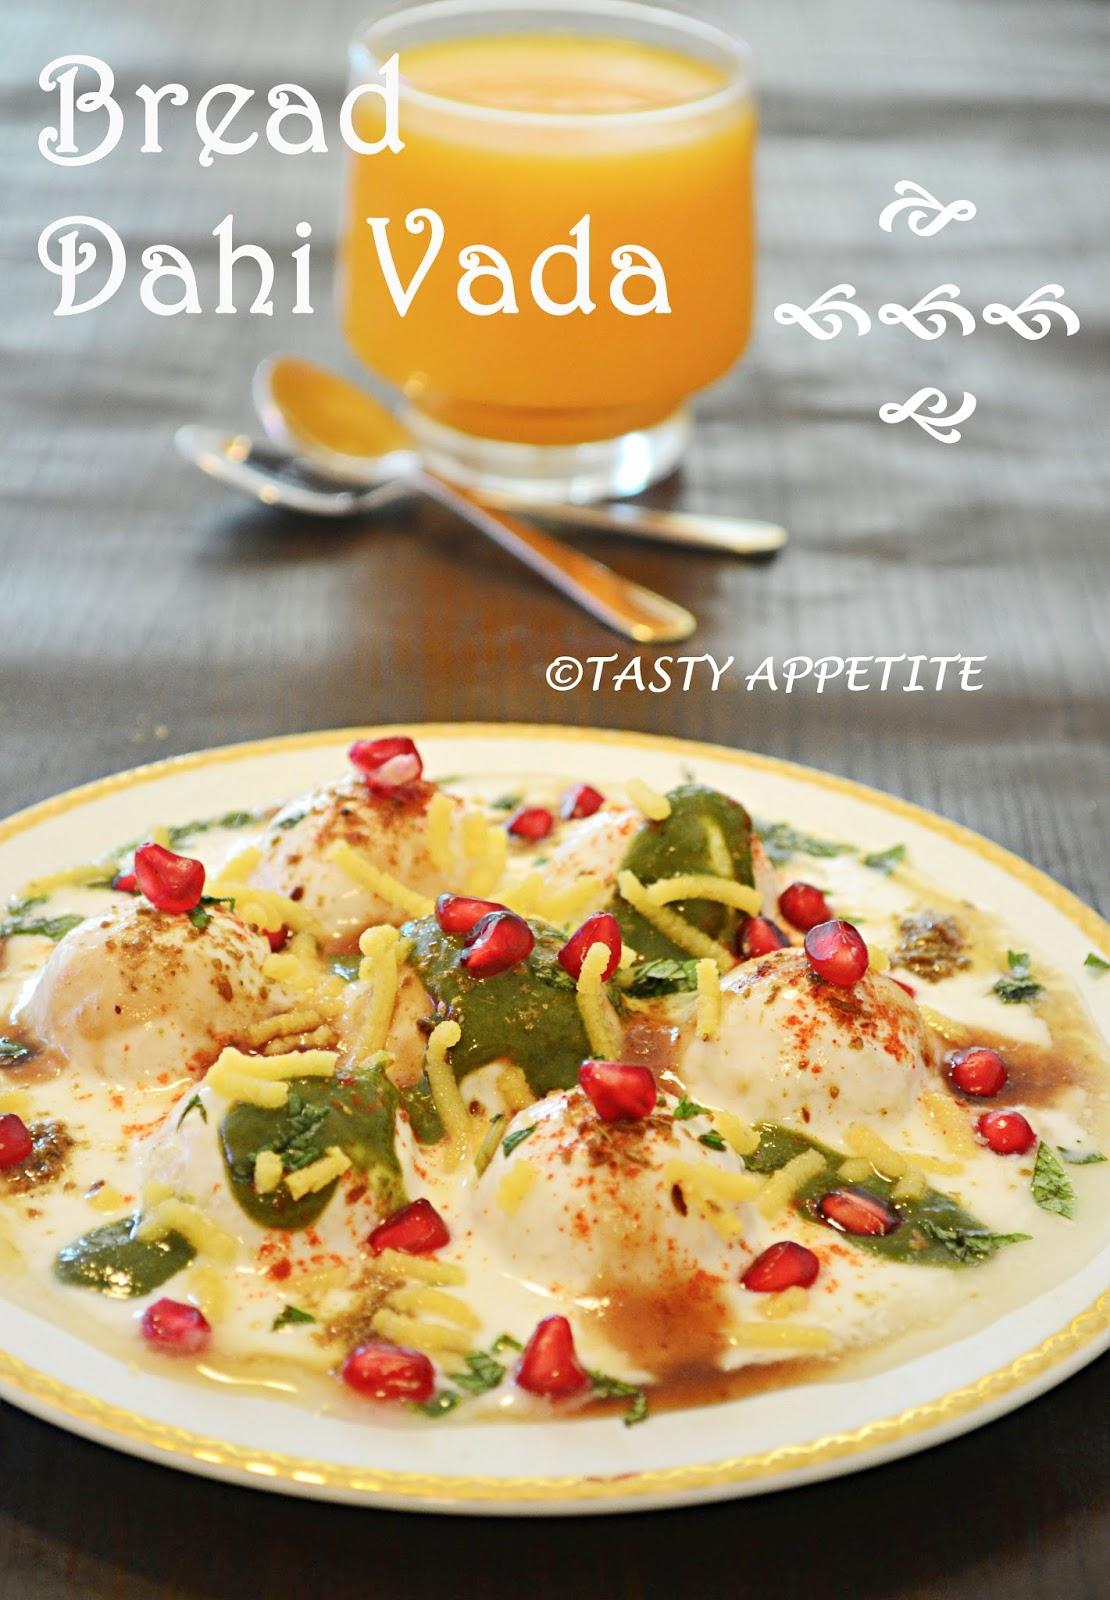 bread dahi vada recipe / easy snacks recipes / healthy snacks